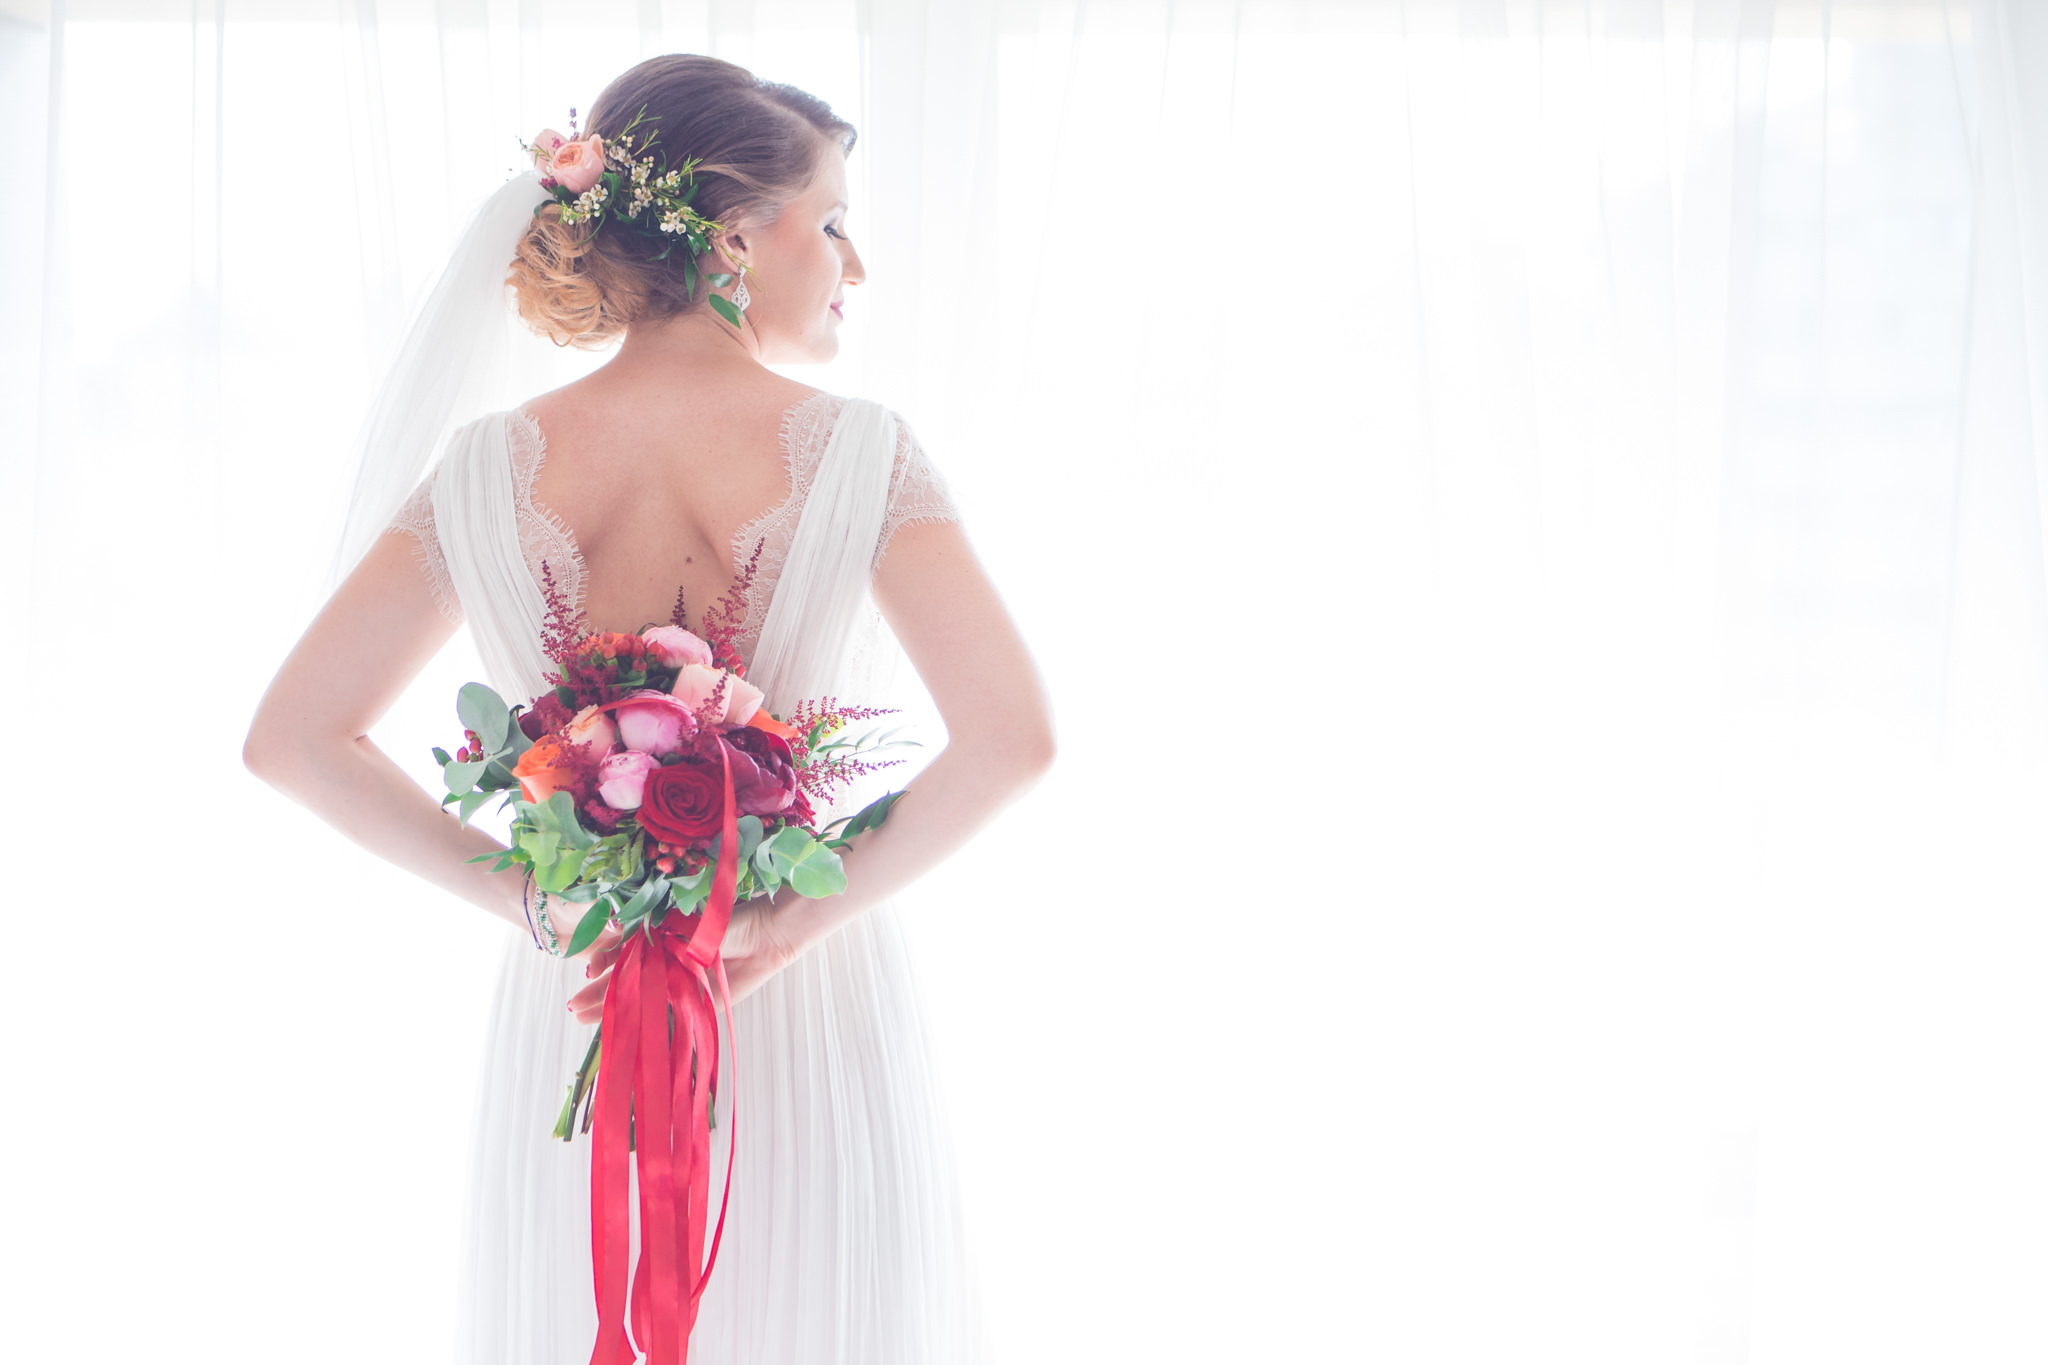 Fotografii nunta - Ploiesti 12